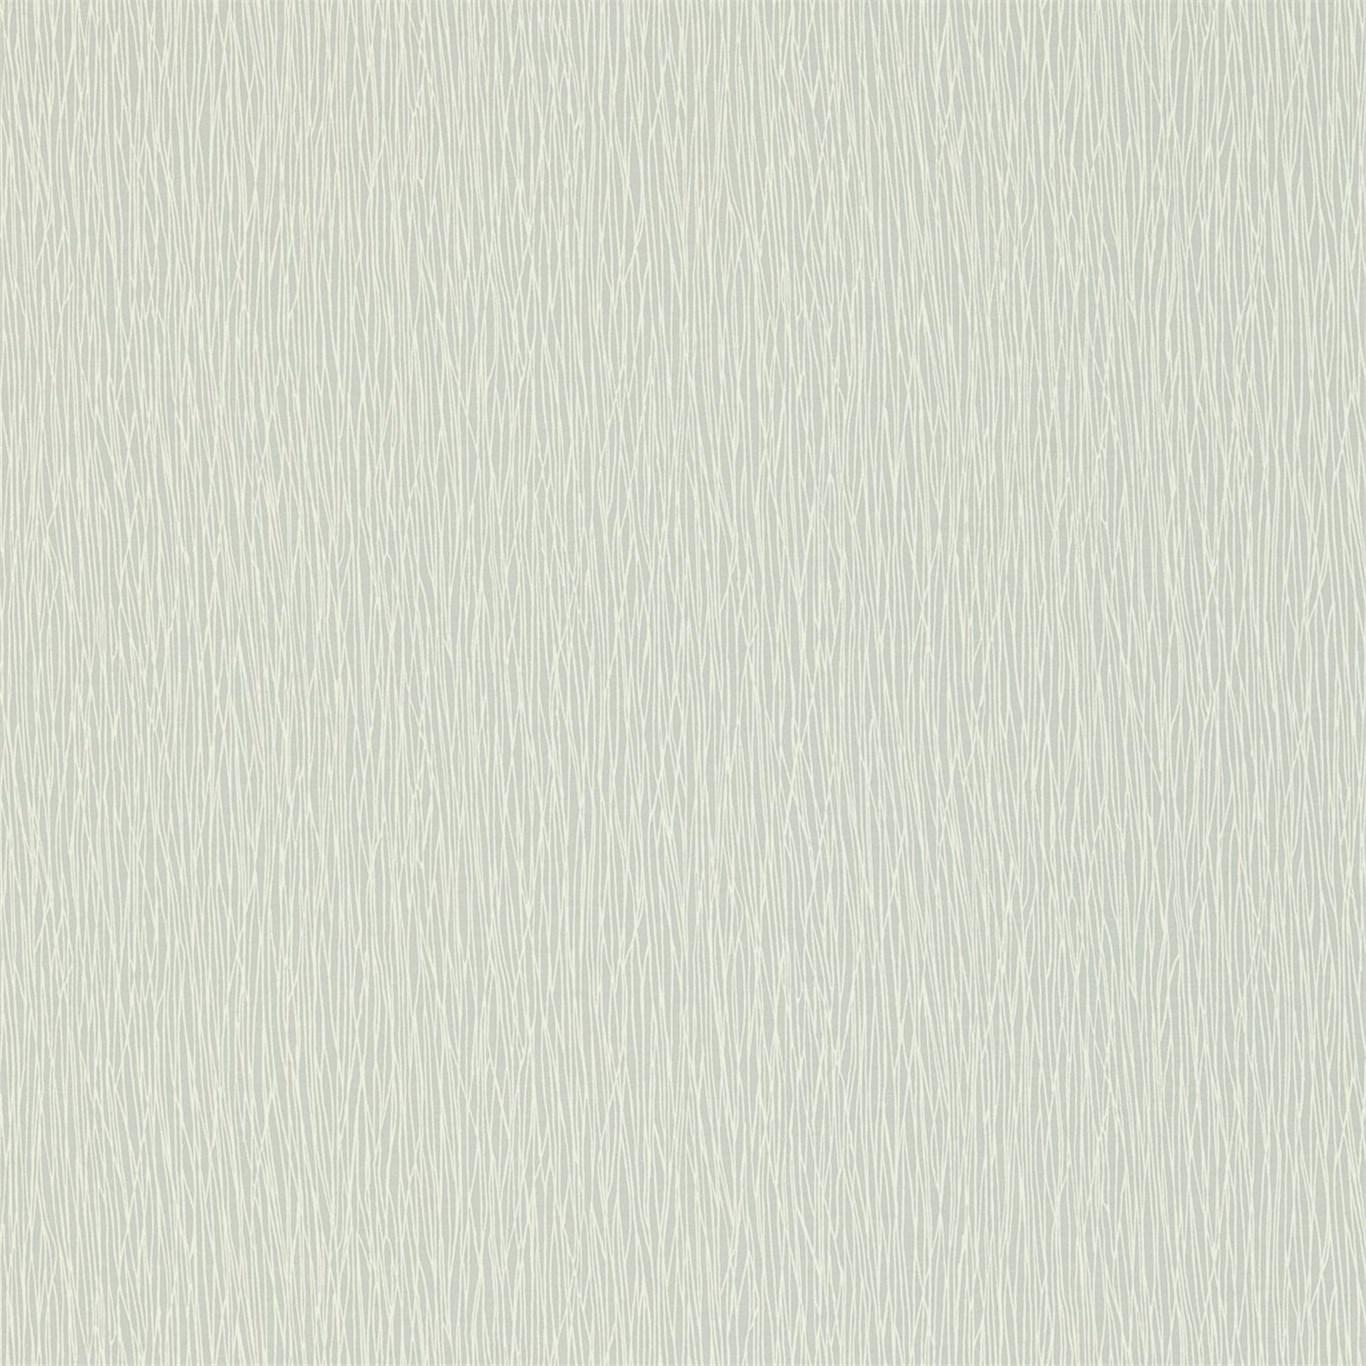 Английские обои Scion,  коллекция Spirit and Soul, артикул110872